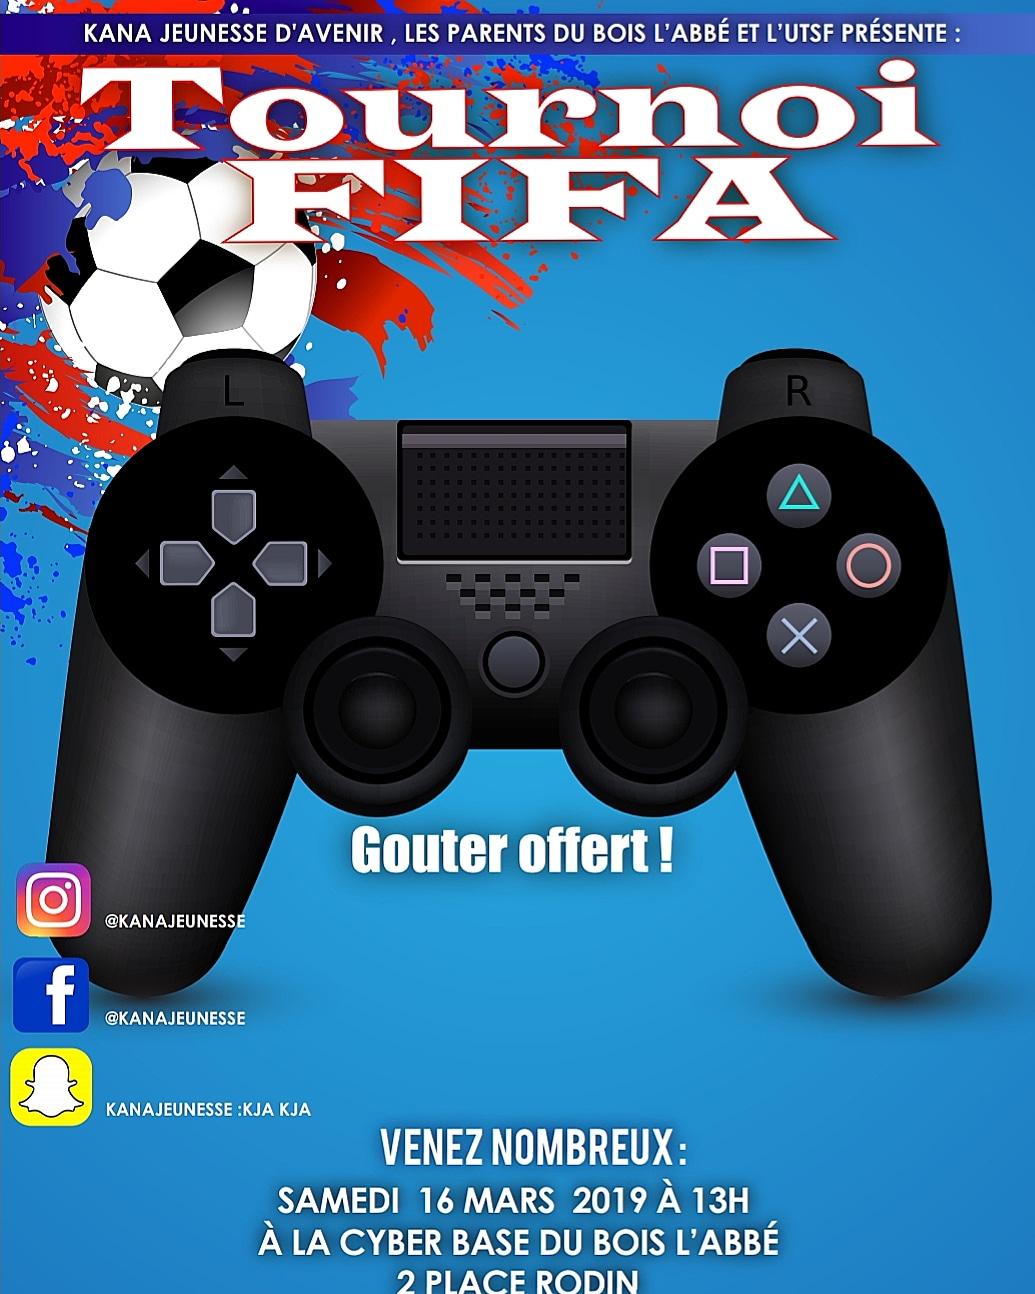 Tournoi sur consoles, FIFA